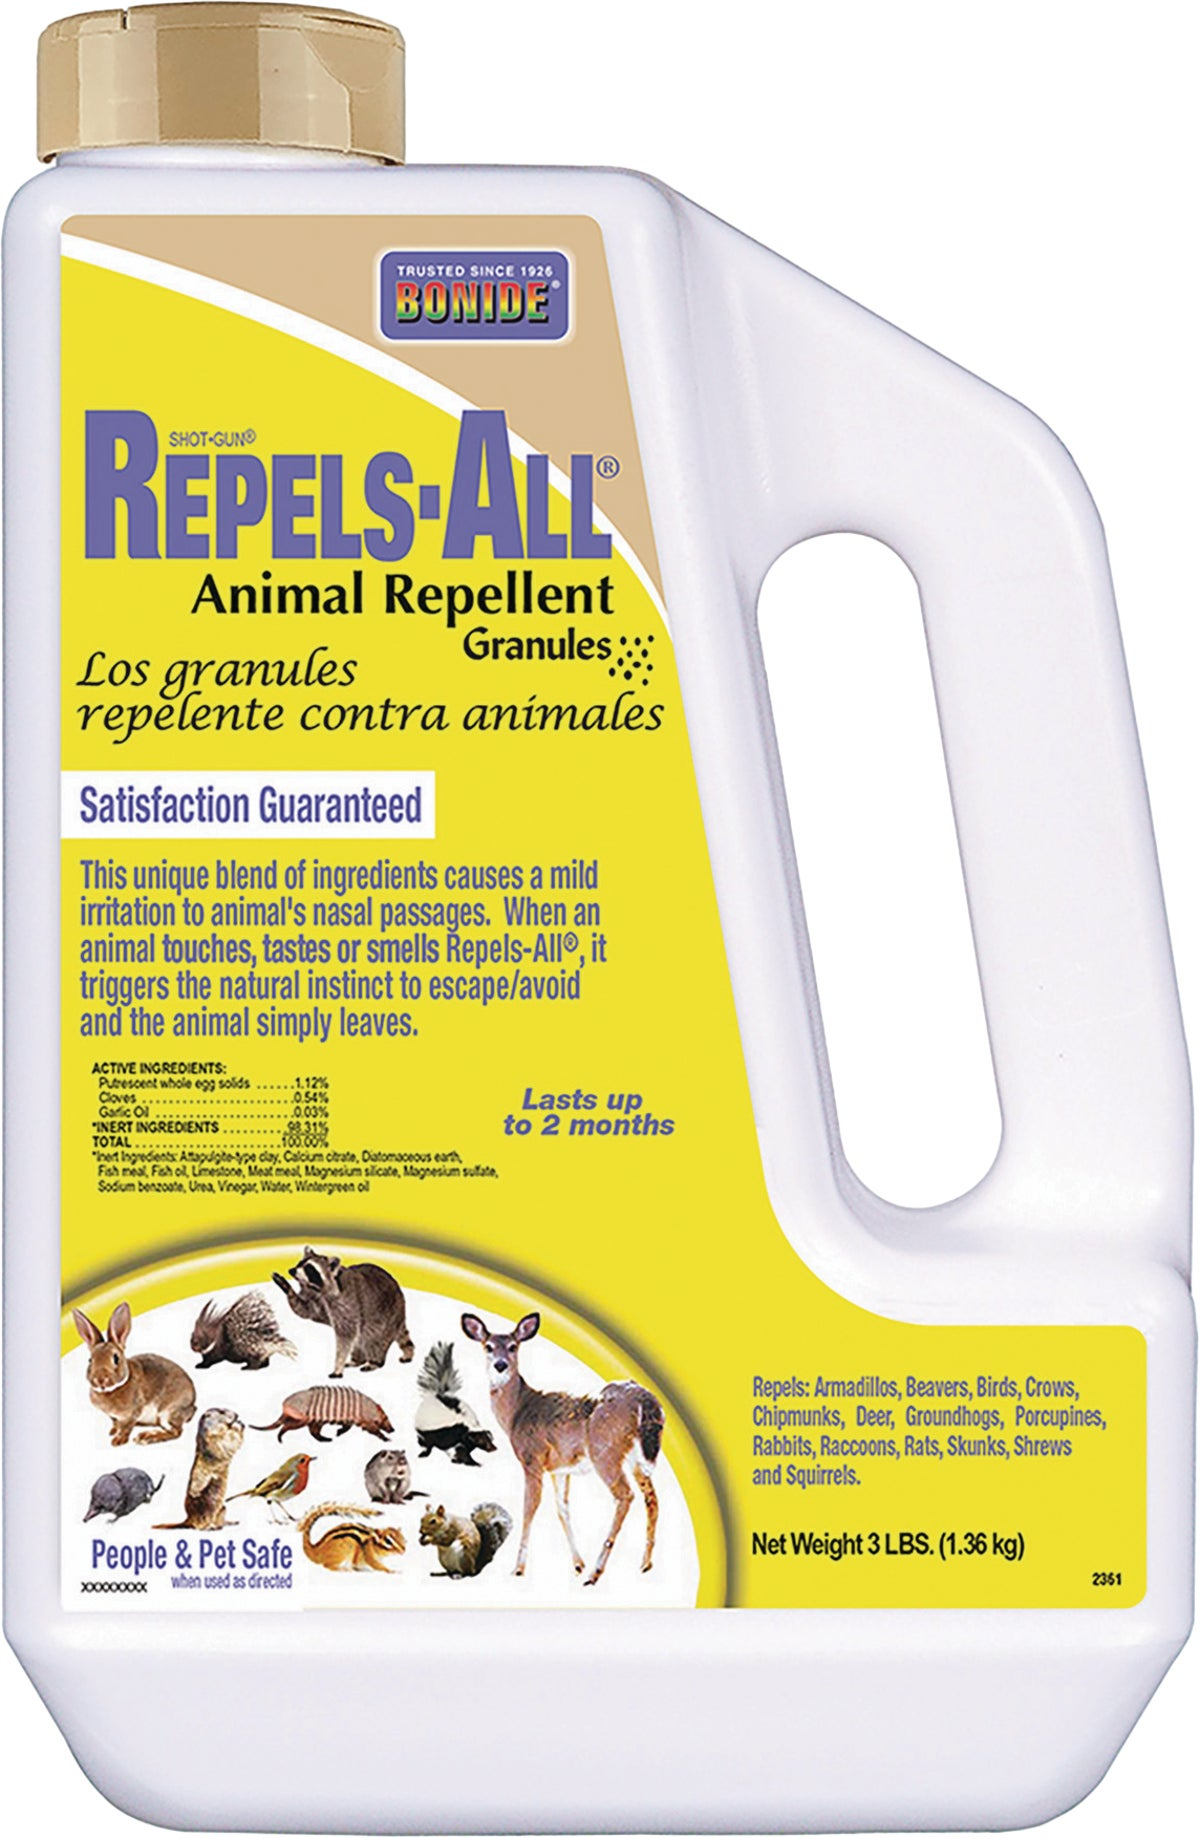 Rabbit Repellent Safe For Dogs : rabbit, repellent, Bonide, Repels, Animal, Repellent, Shaker